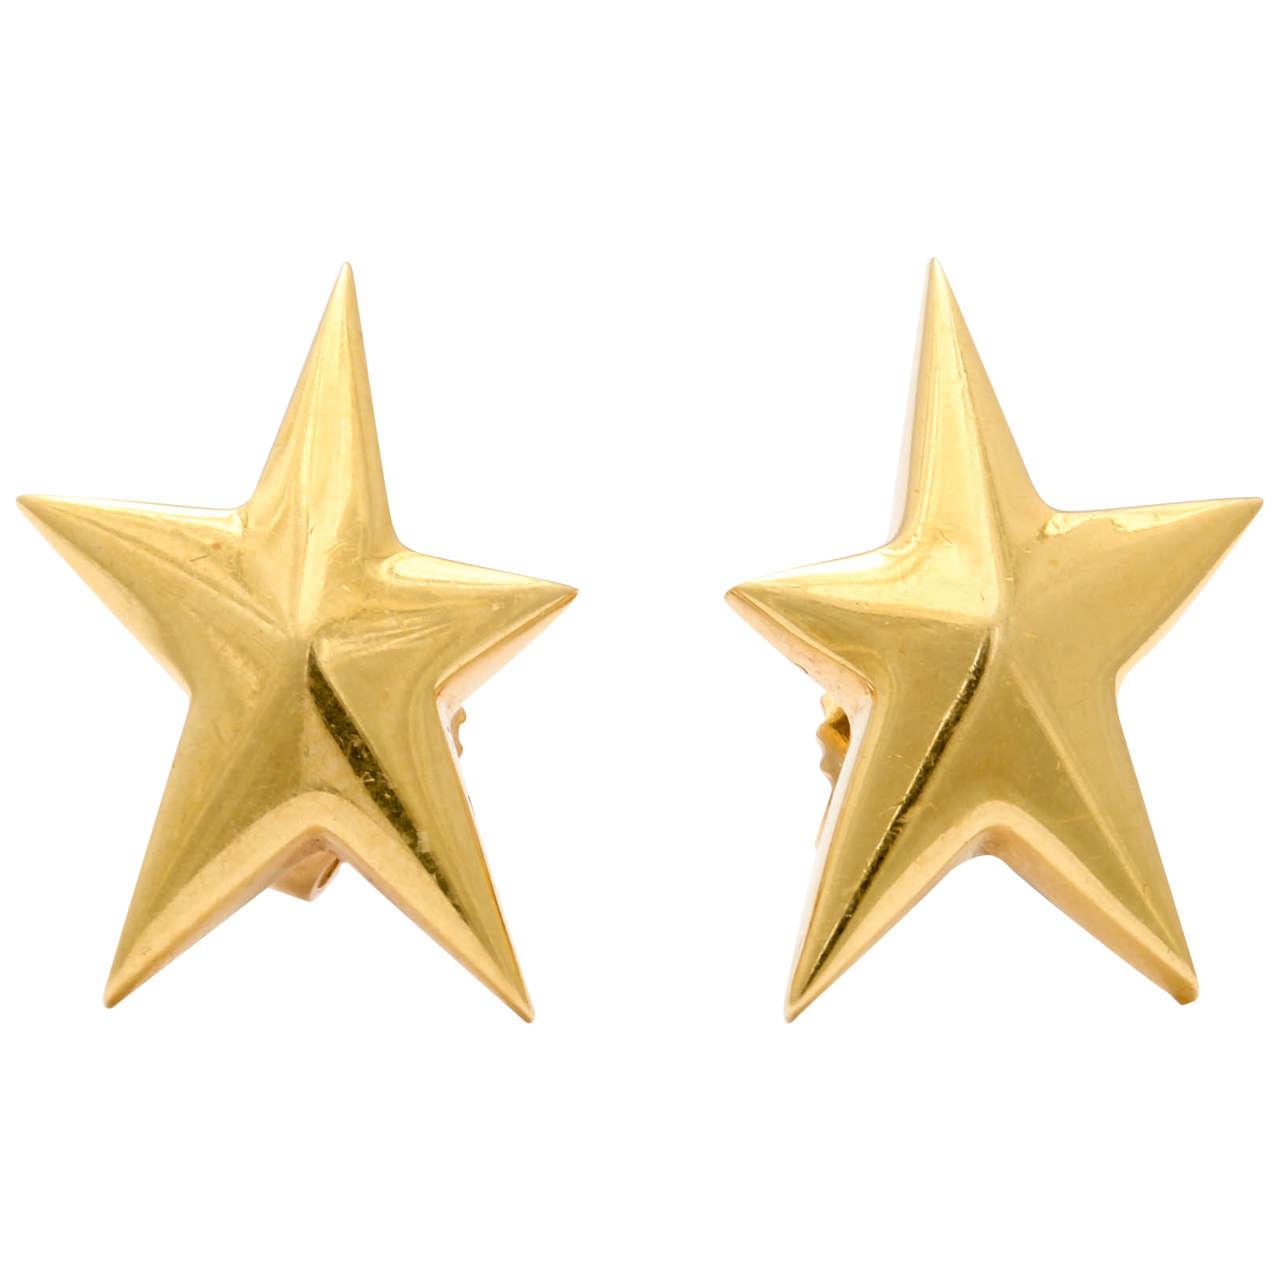 b6ea11f34 Tiffany & Co. Angela Cummings Star Earrings For Sale. 18kt Yellow Gold Star  Earrings made ...